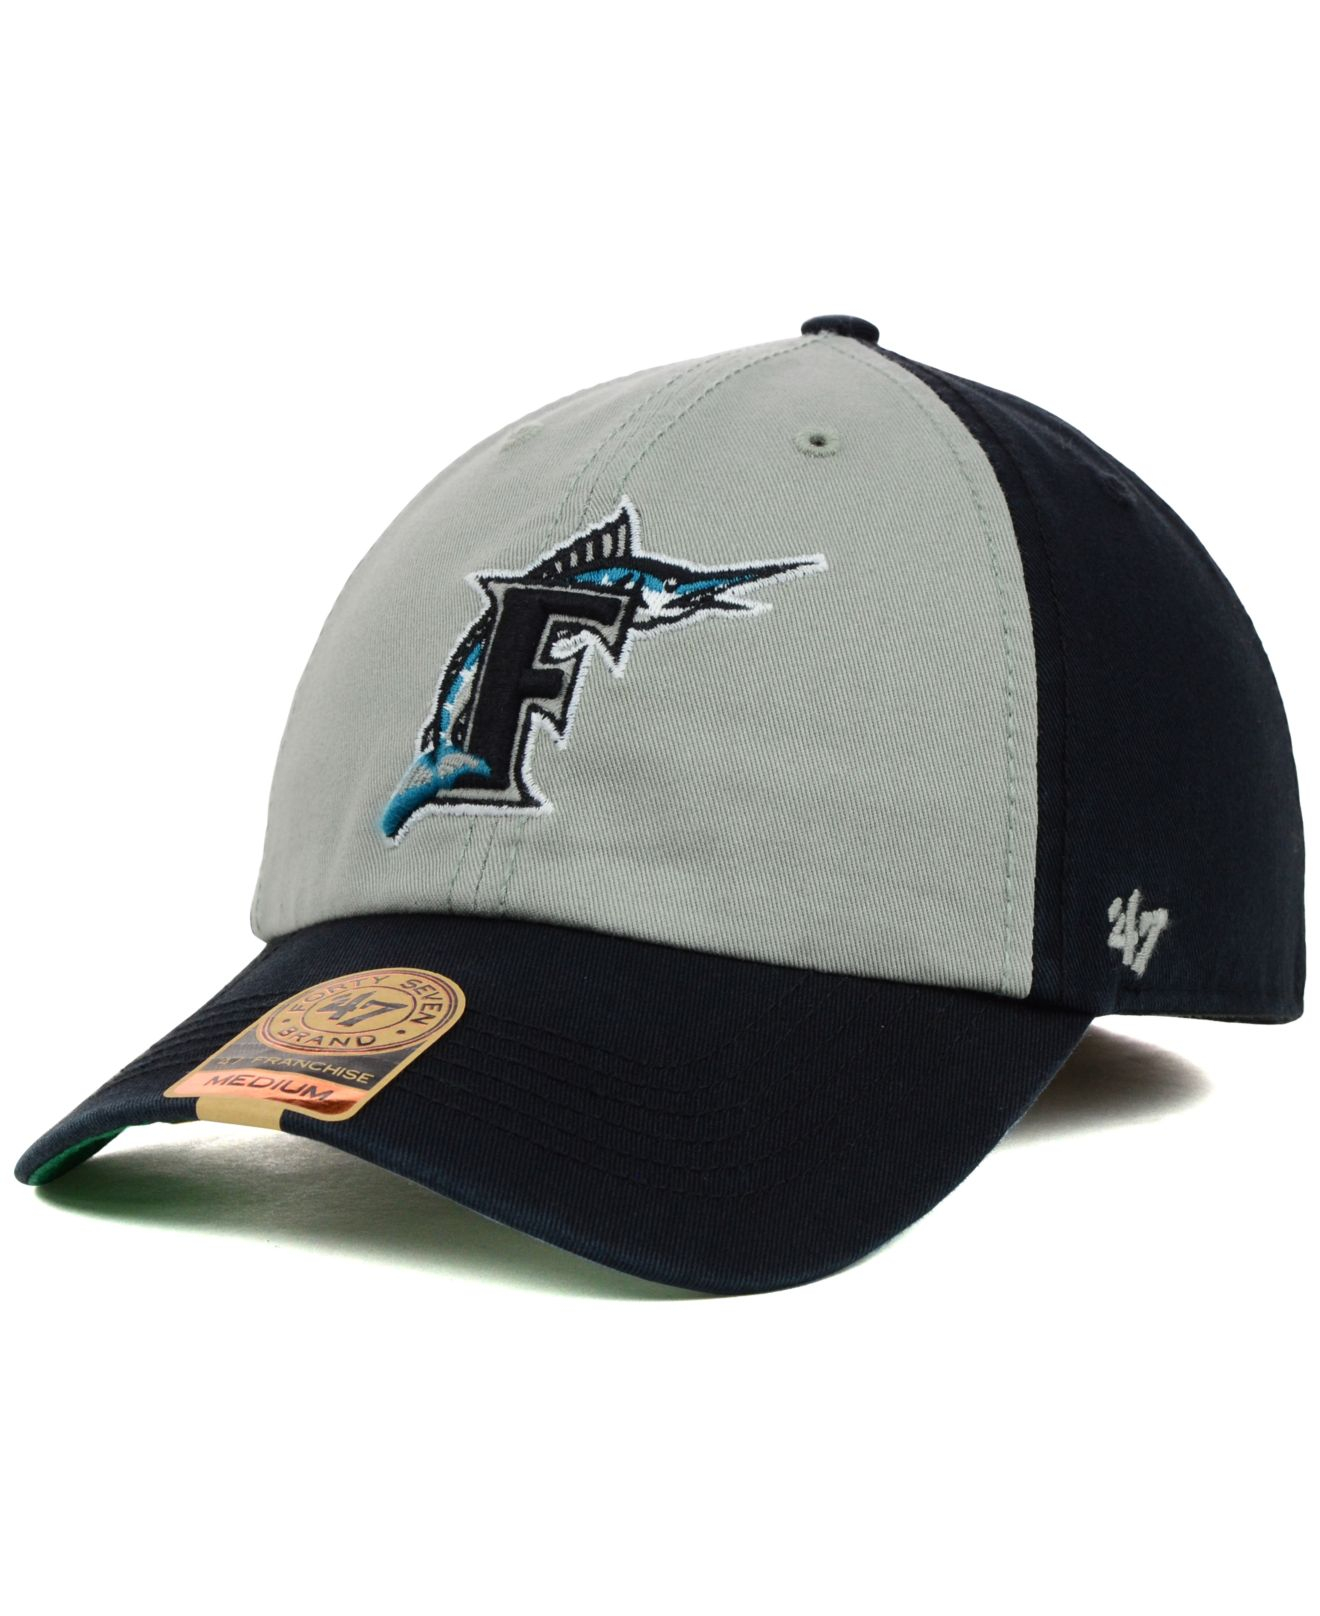 55c424b86e010 Lyst - 47 Brand Florida Marlins Mlb Vip Franchise Cap in Black for Men